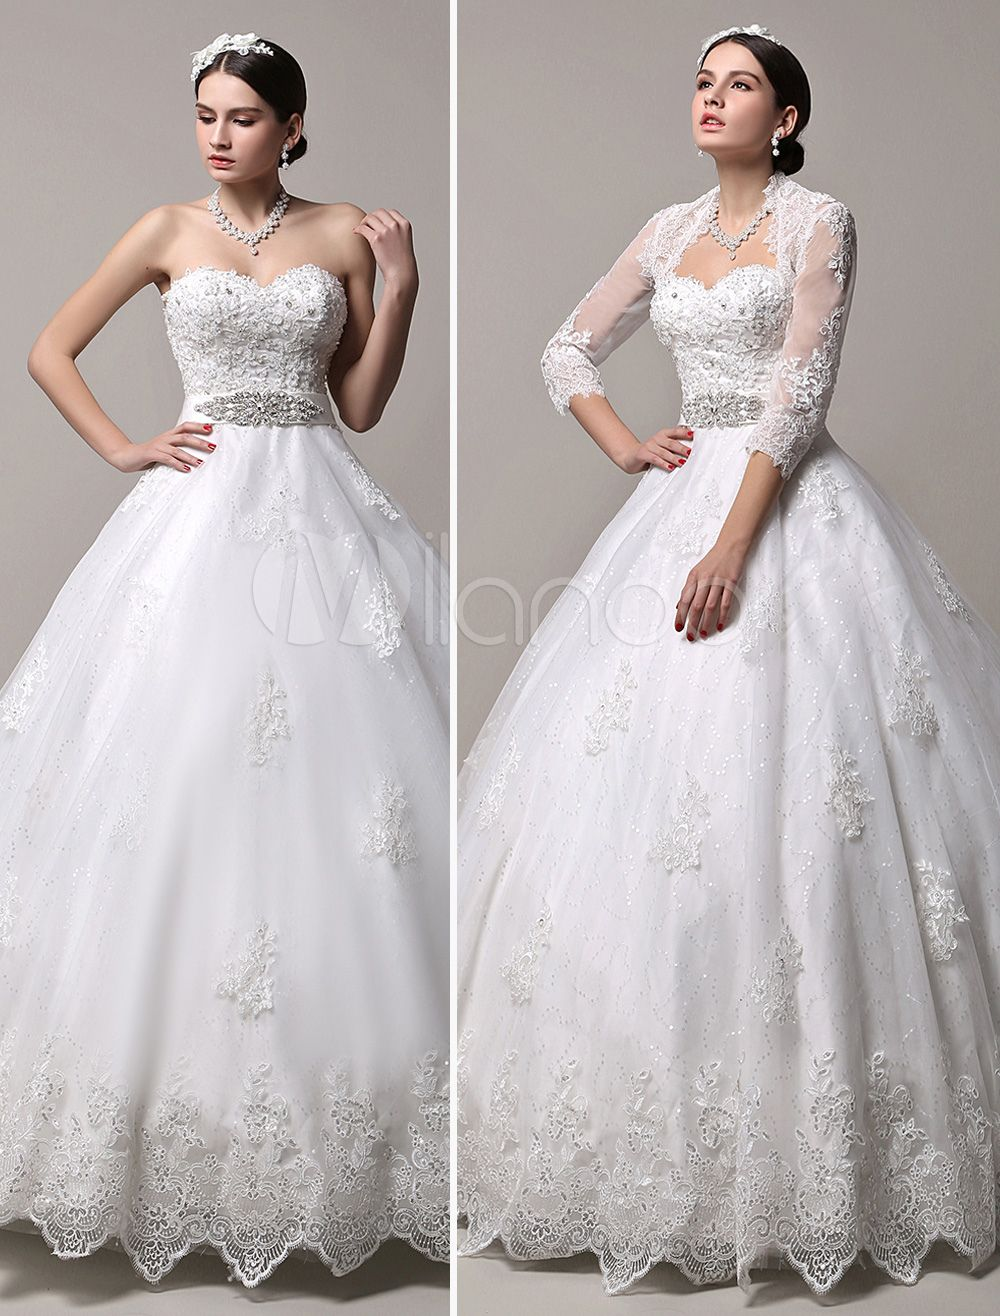 Princess Wedding Dresses Strapless Sweetheart Neckline